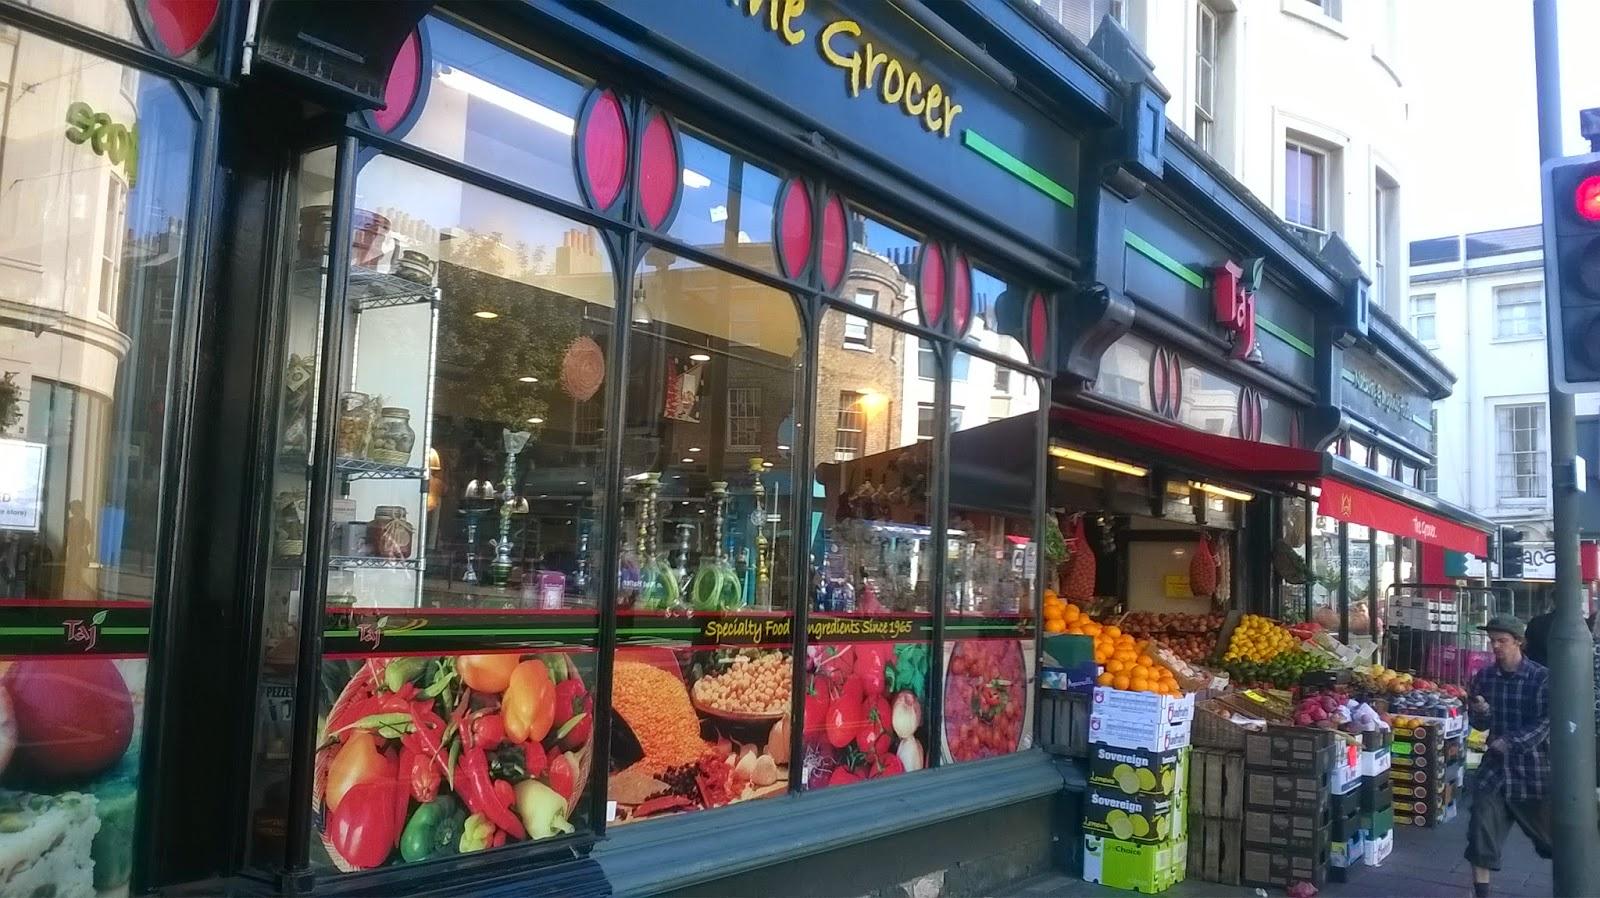 Images PK: Halal Food in Brighton